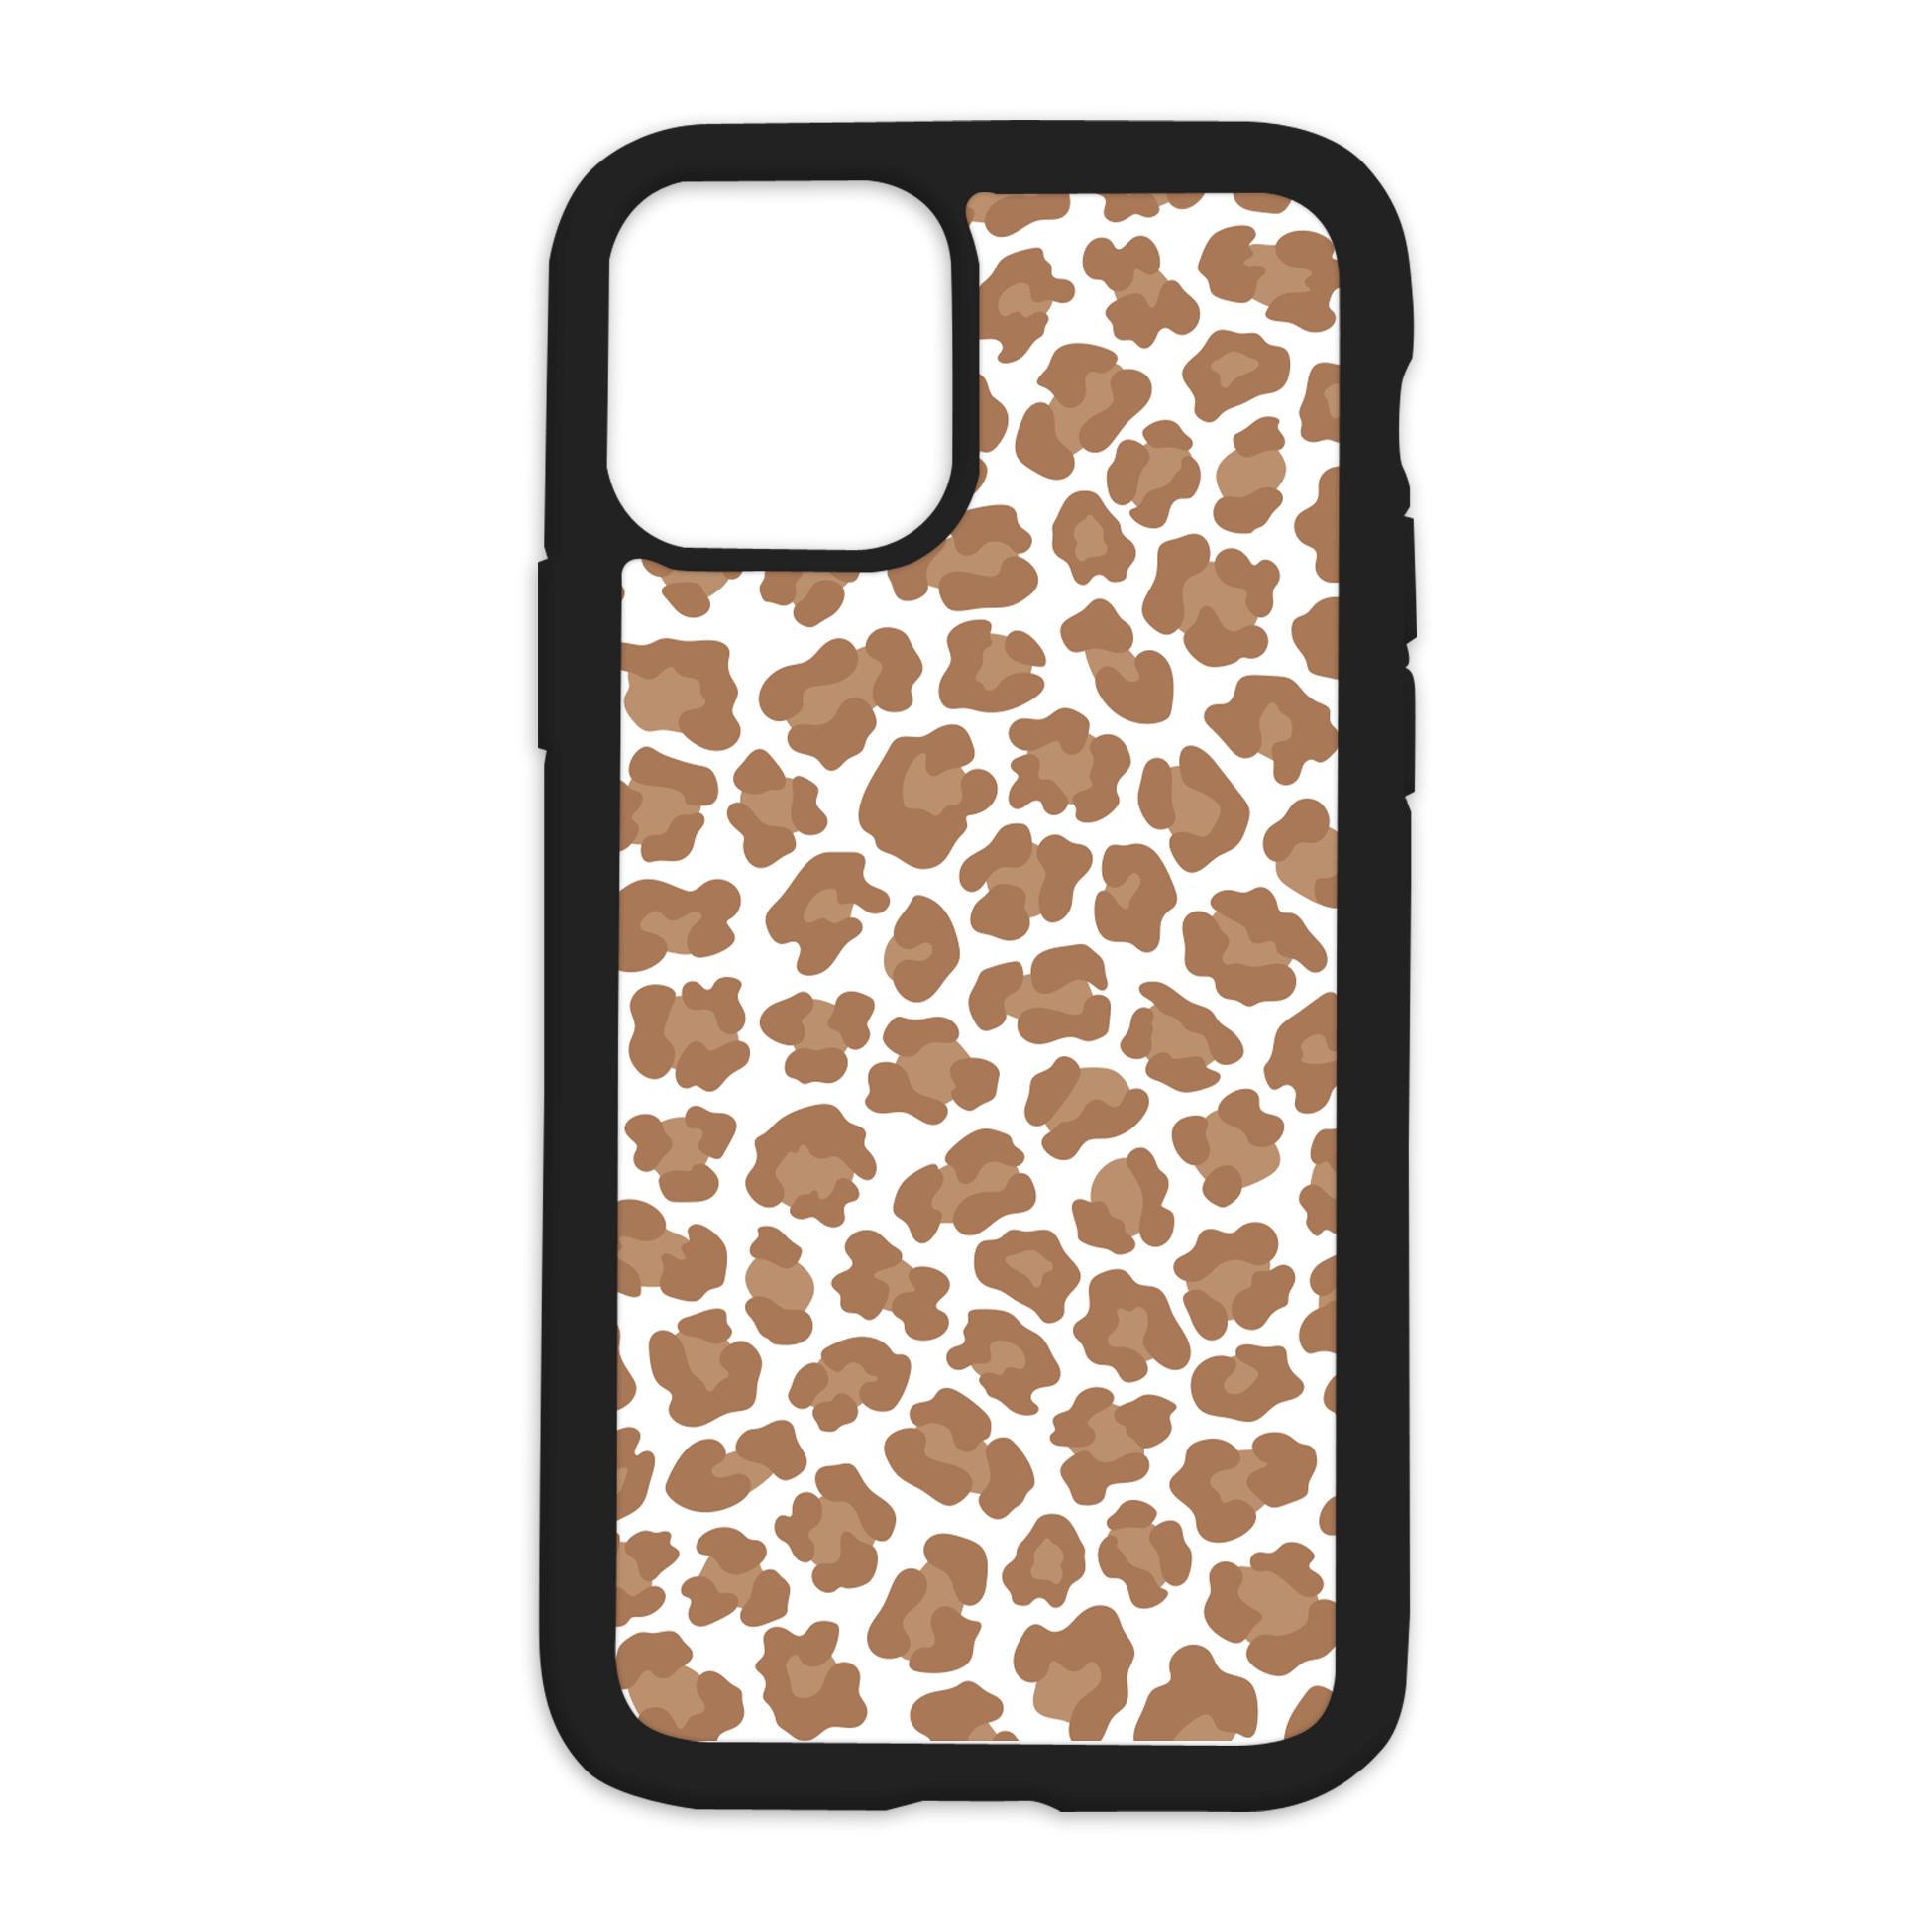 Leopard Print Design On Black Phone Case - XS MAX / Brown